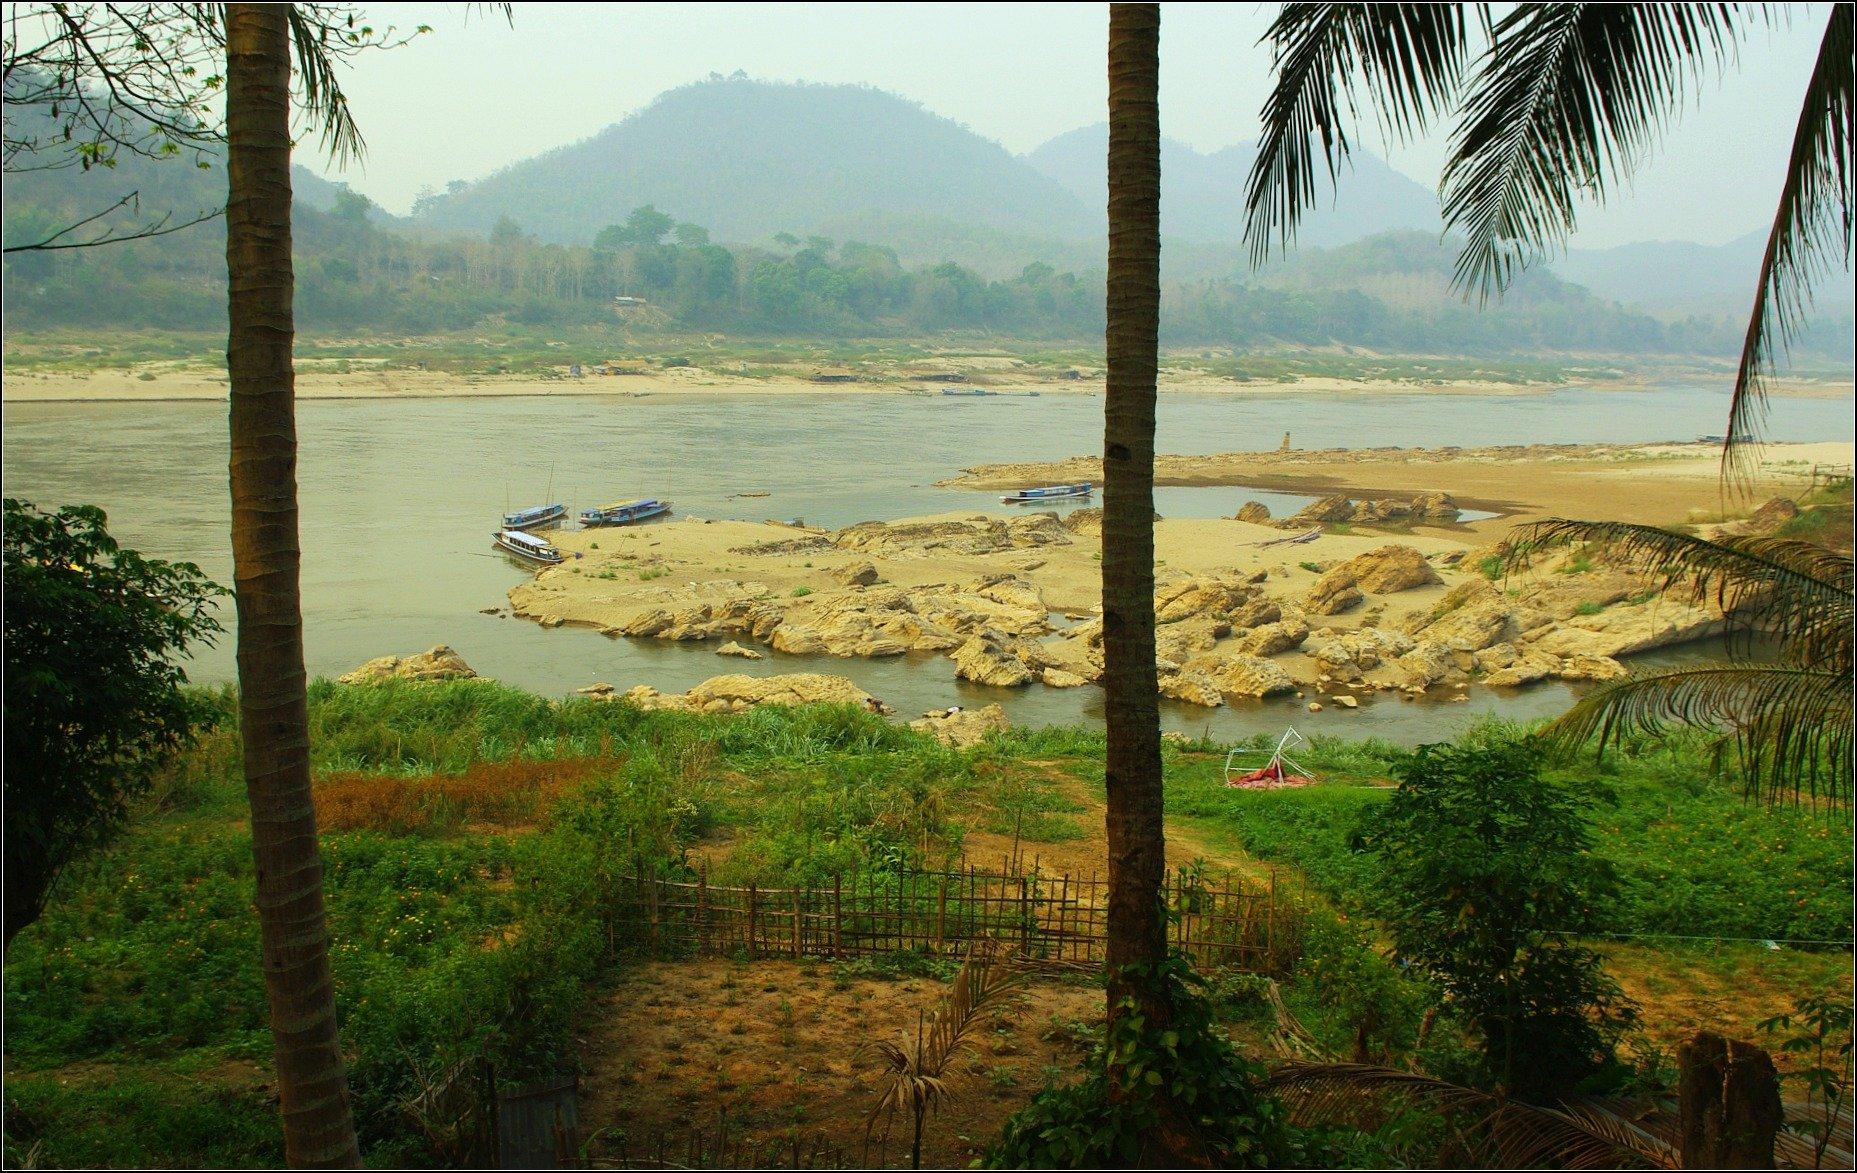 Luang Prabang where Rivers Meet